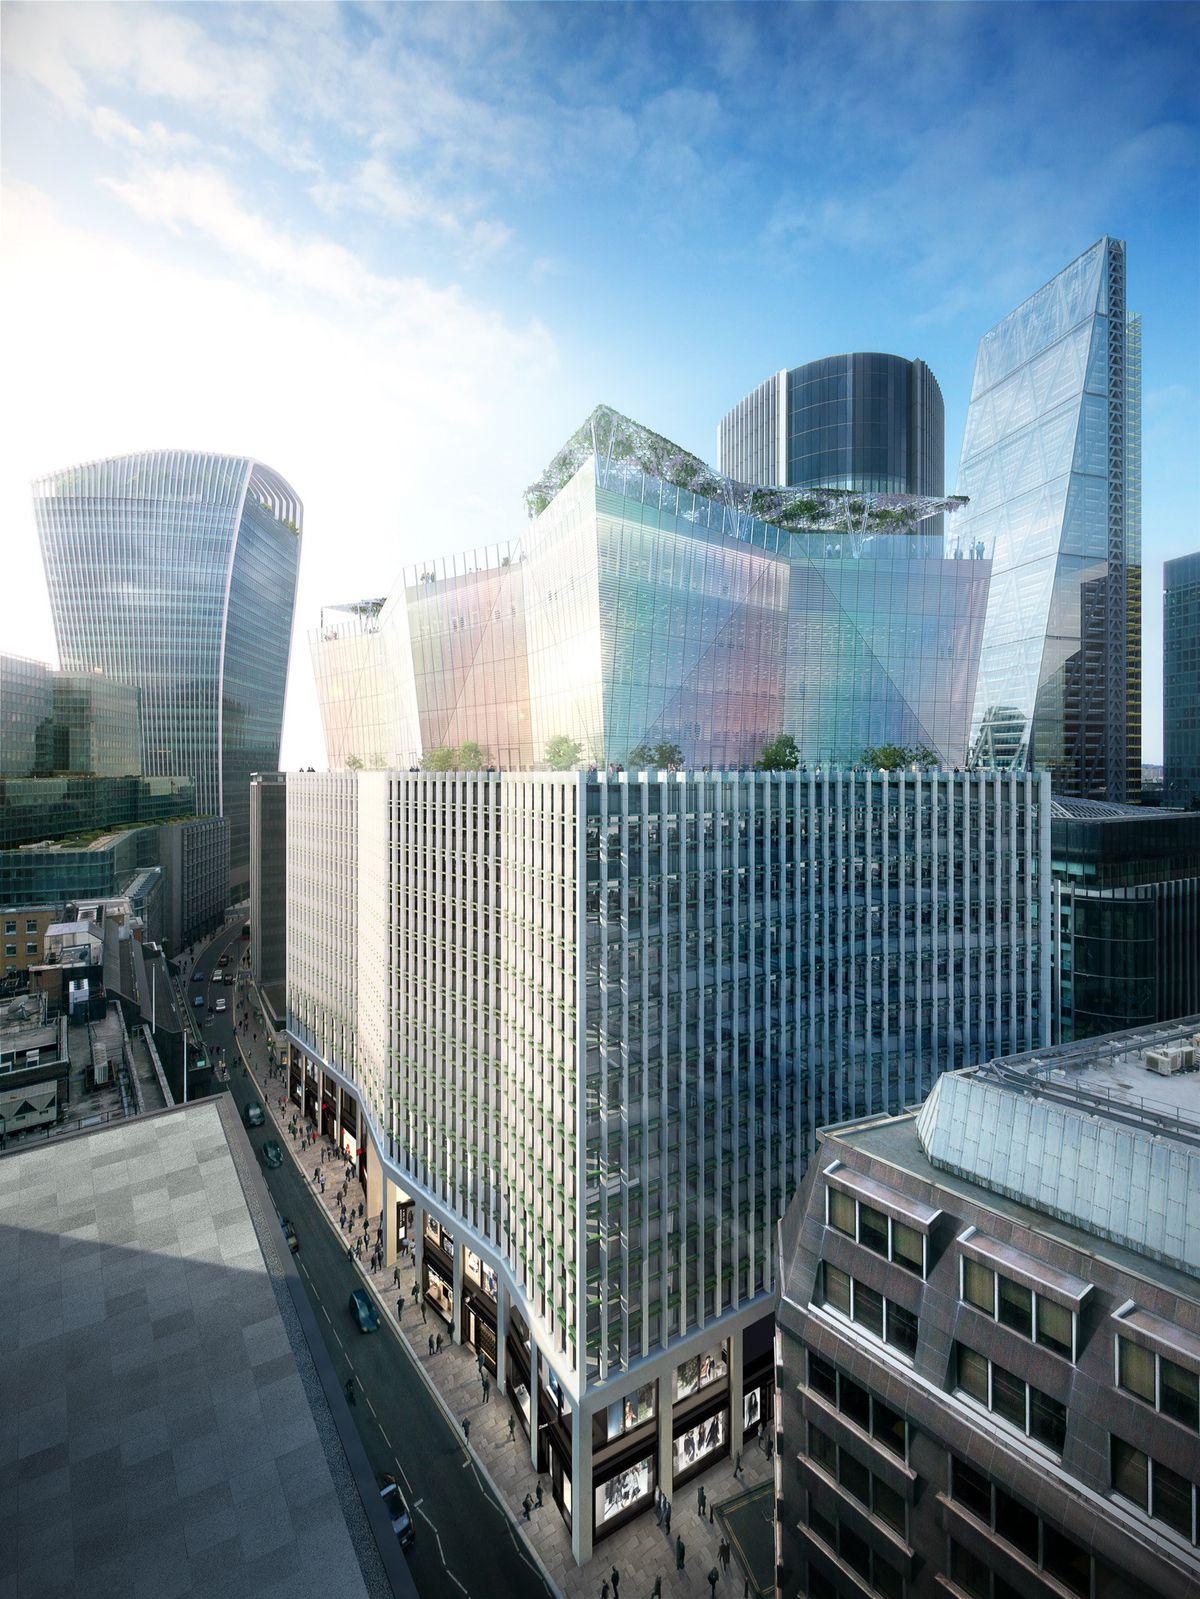 D&D London Announces New Rooftop Restaurant at 120 Fenchurch